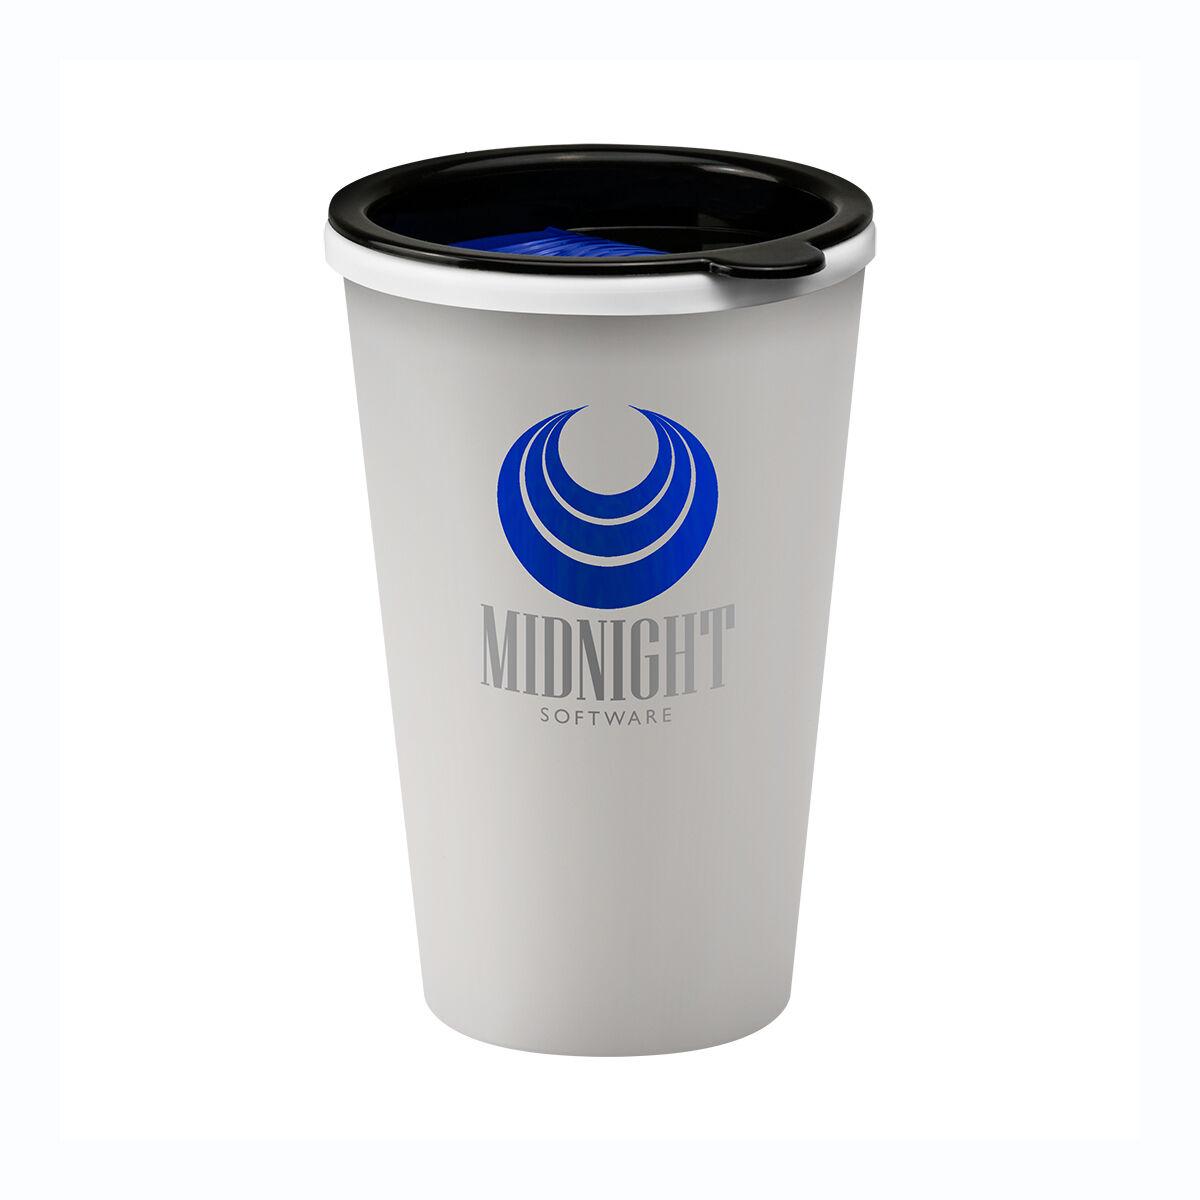 Universal Travel Mug with hot drink sip lid